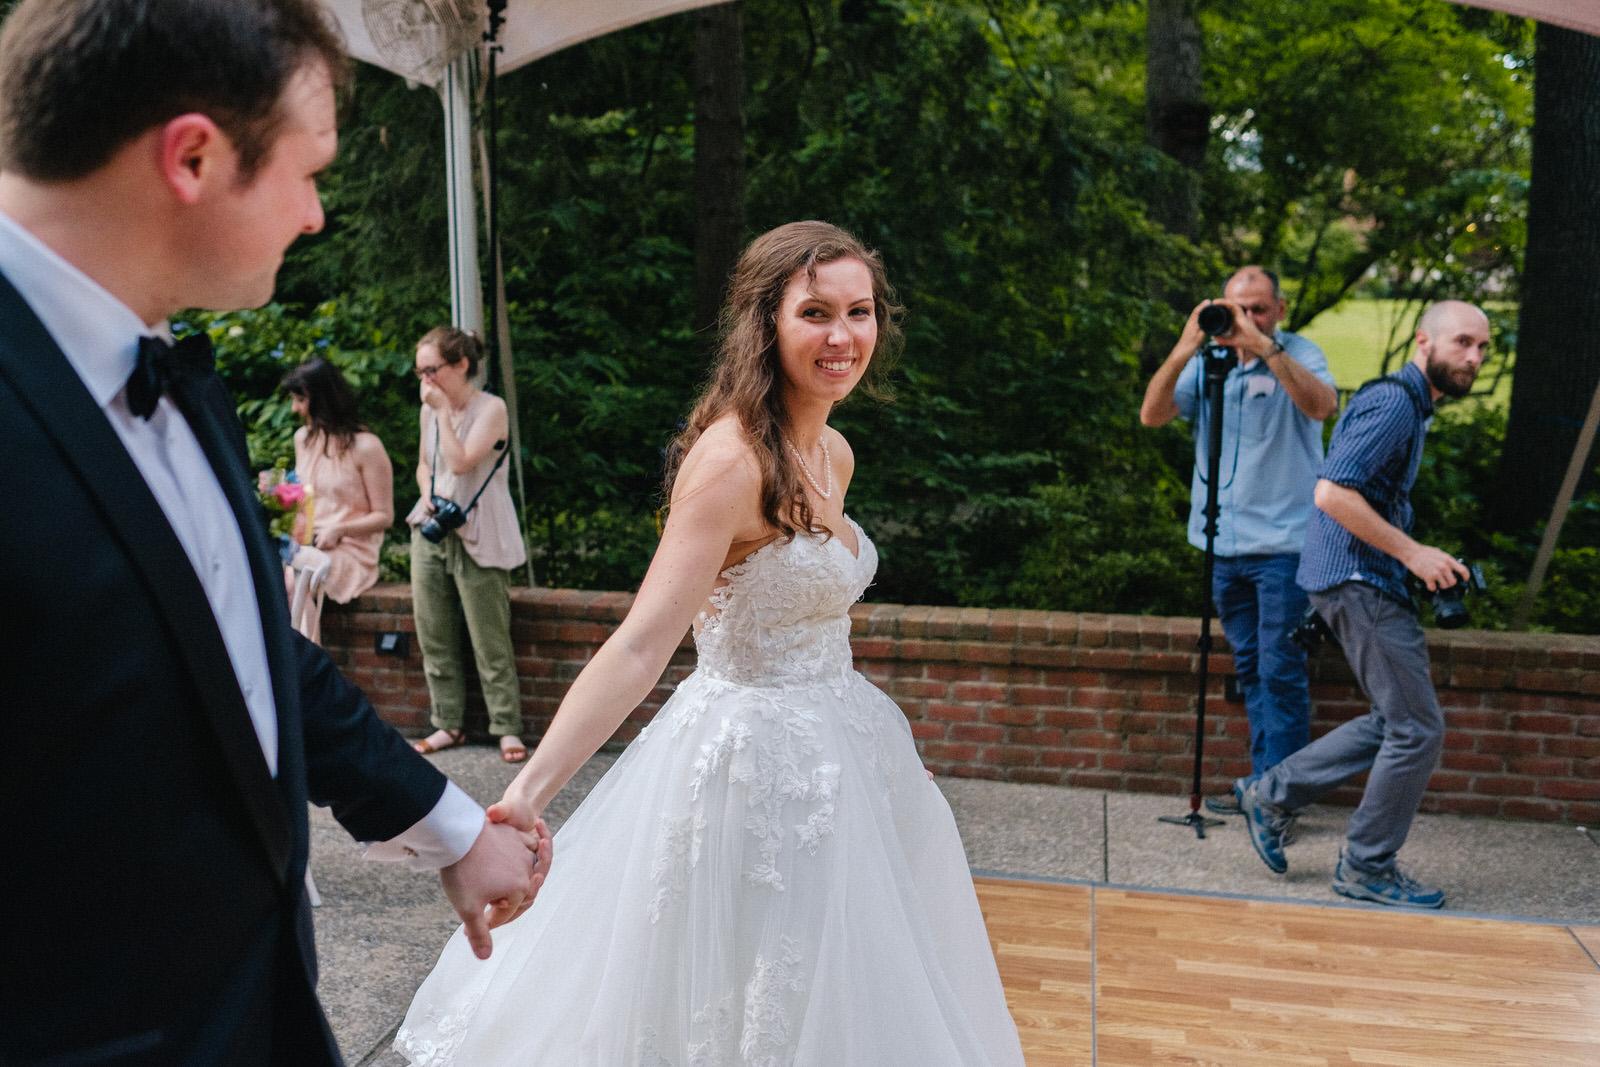 mississippi-wedding-photographer-BTS-145.JPG